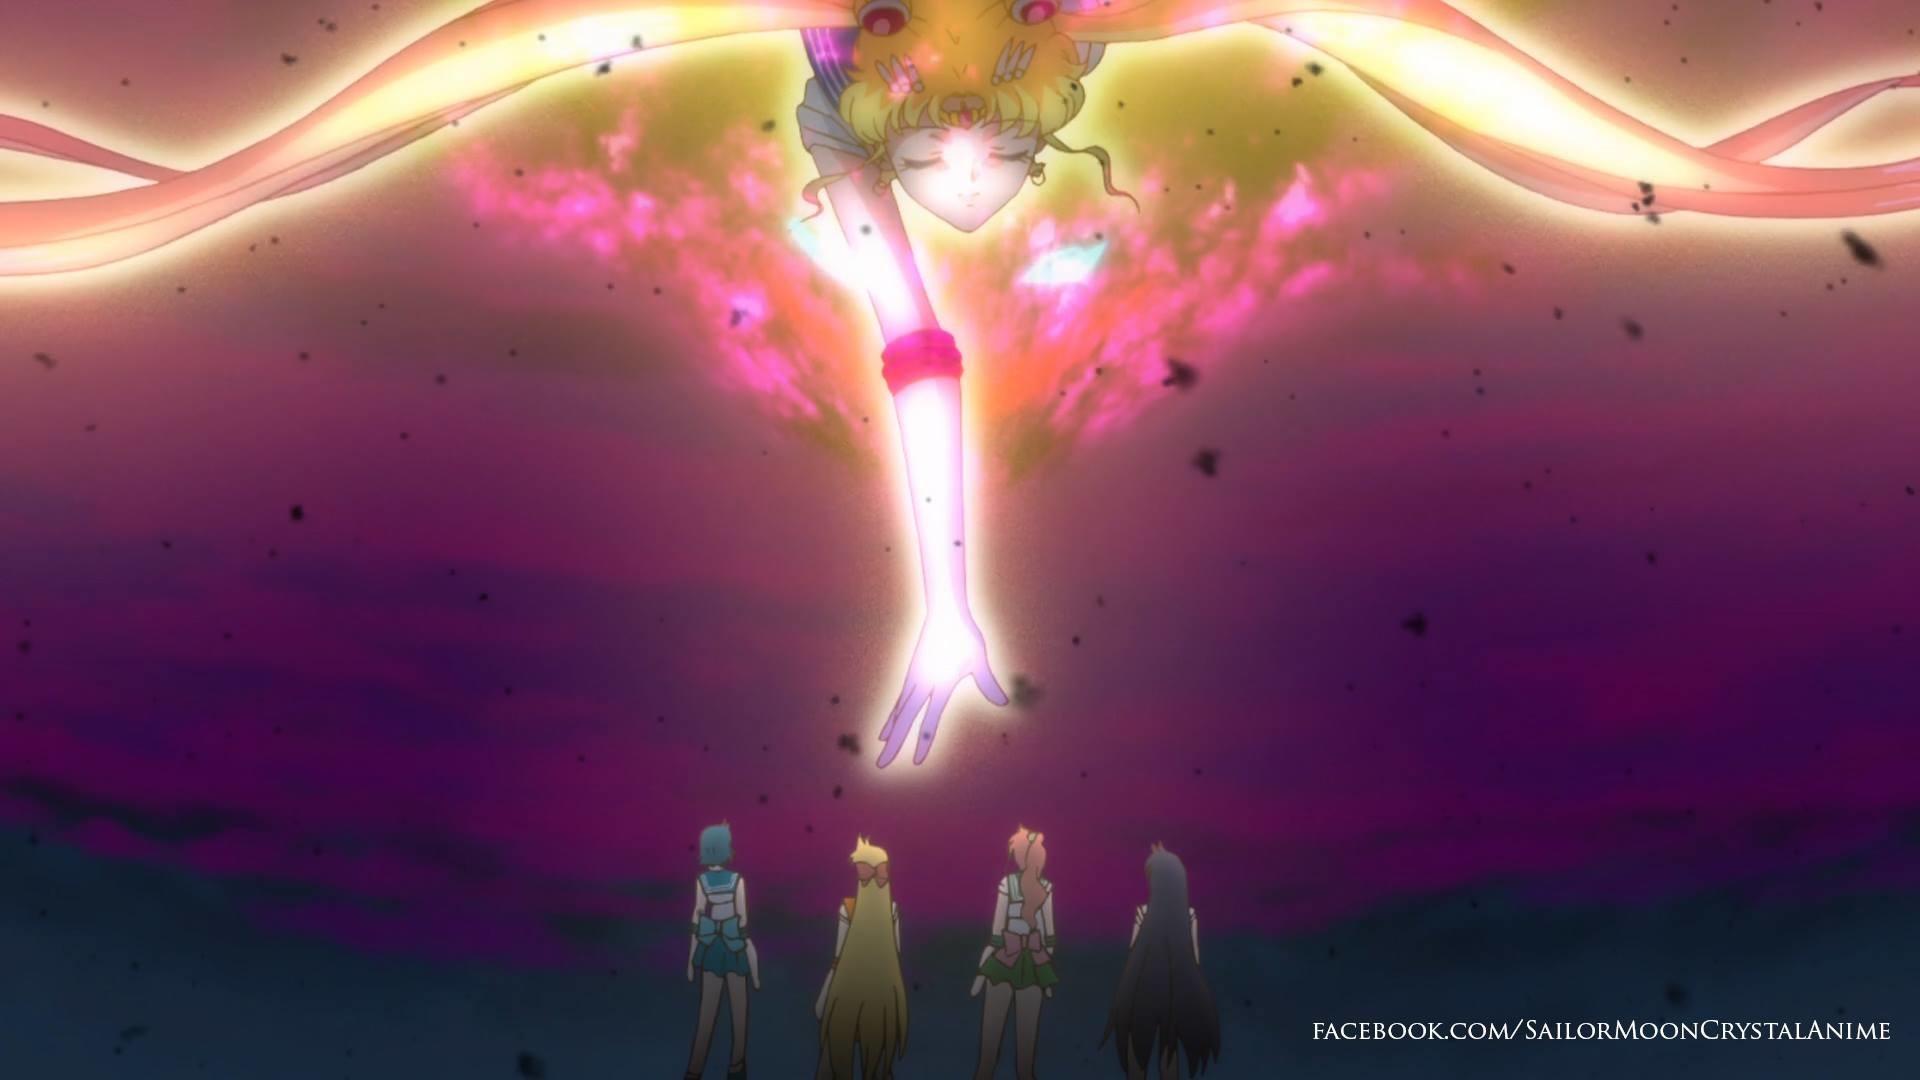 Sailor Moon's Spirit and the Sailor Guardians – Sailor Moon Crystal